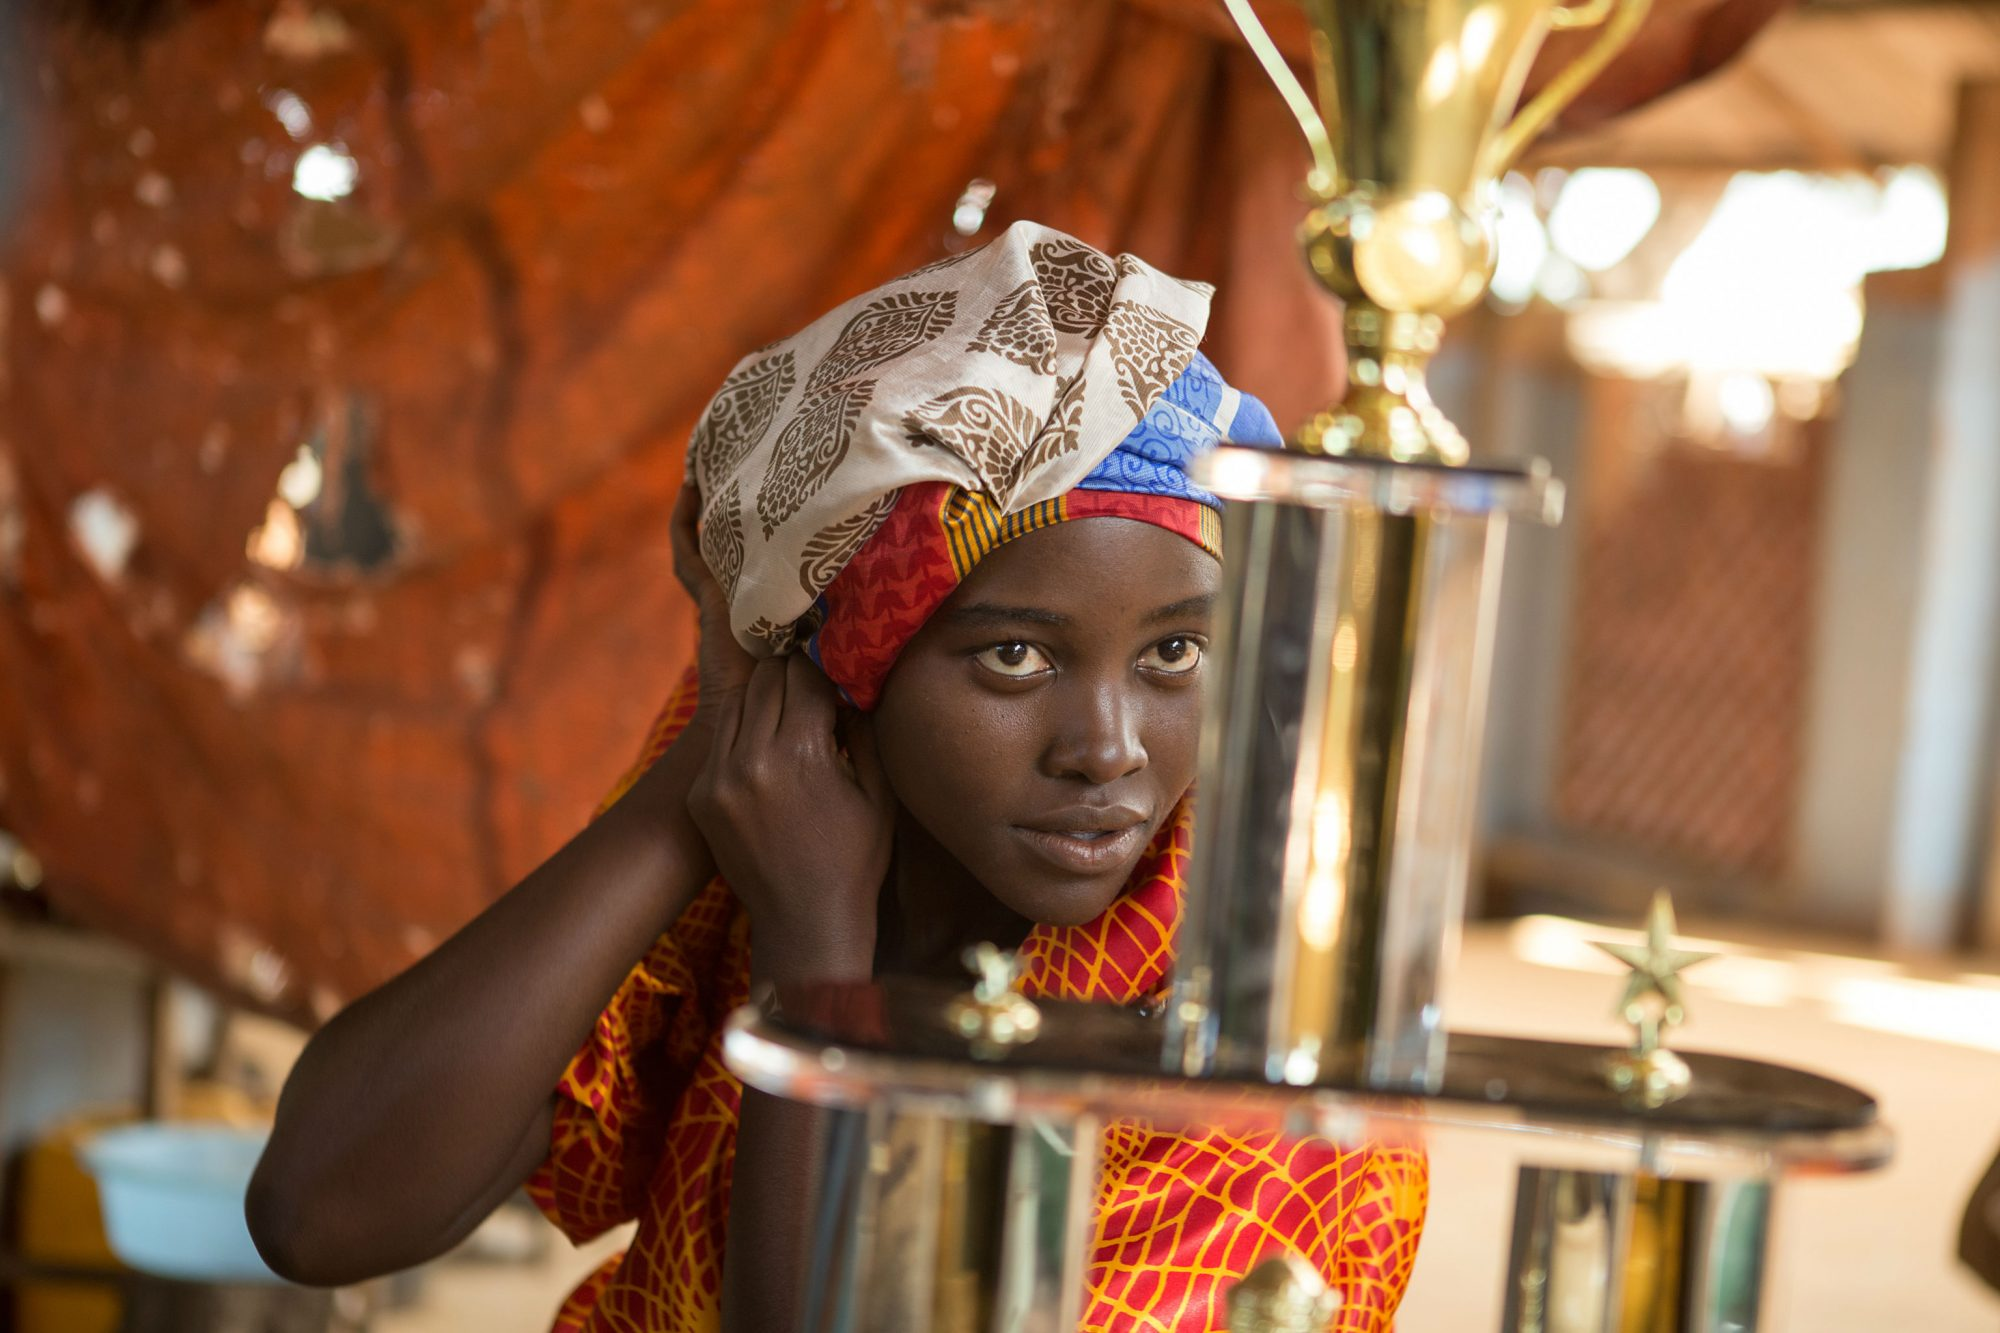 Queen-of-Katwe-Lupita-Nyongo-as-Harriet-Mutesi.jpg